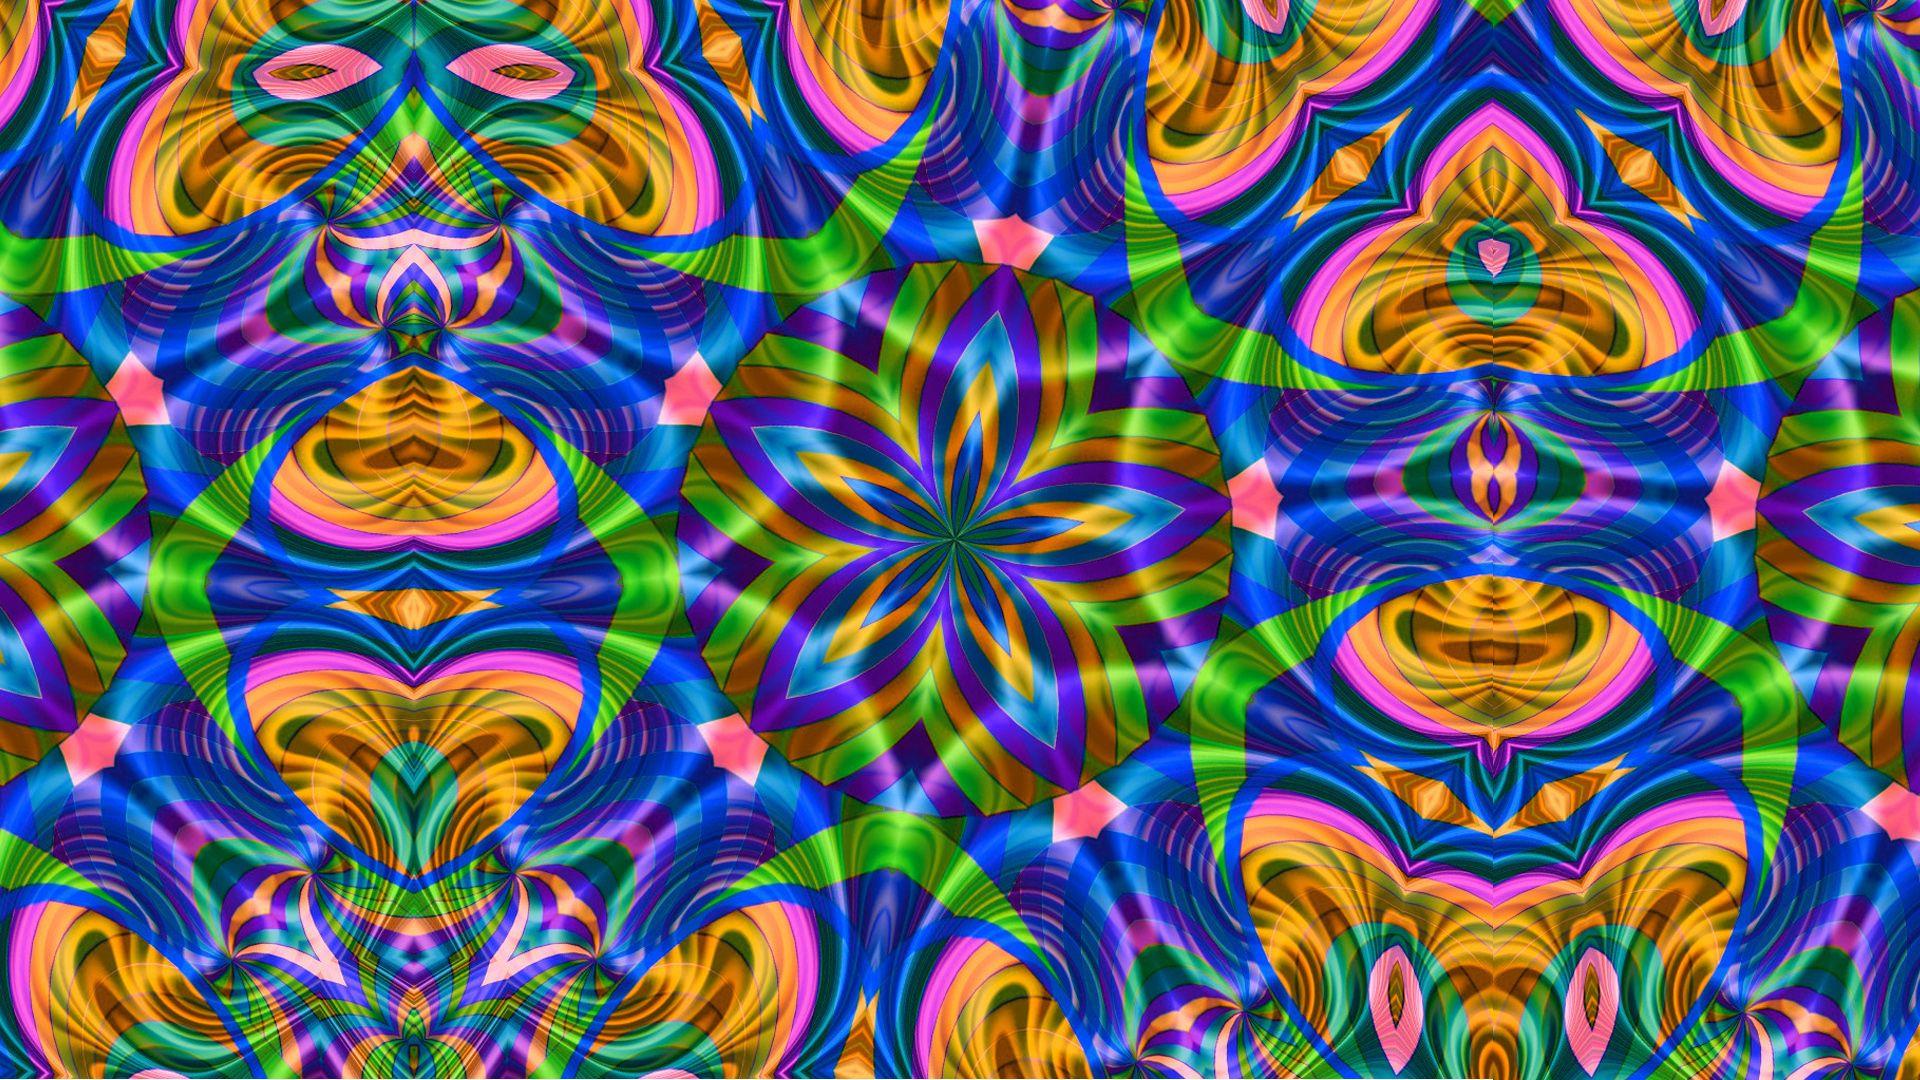 Kaleidoscope download free wallpaper image search